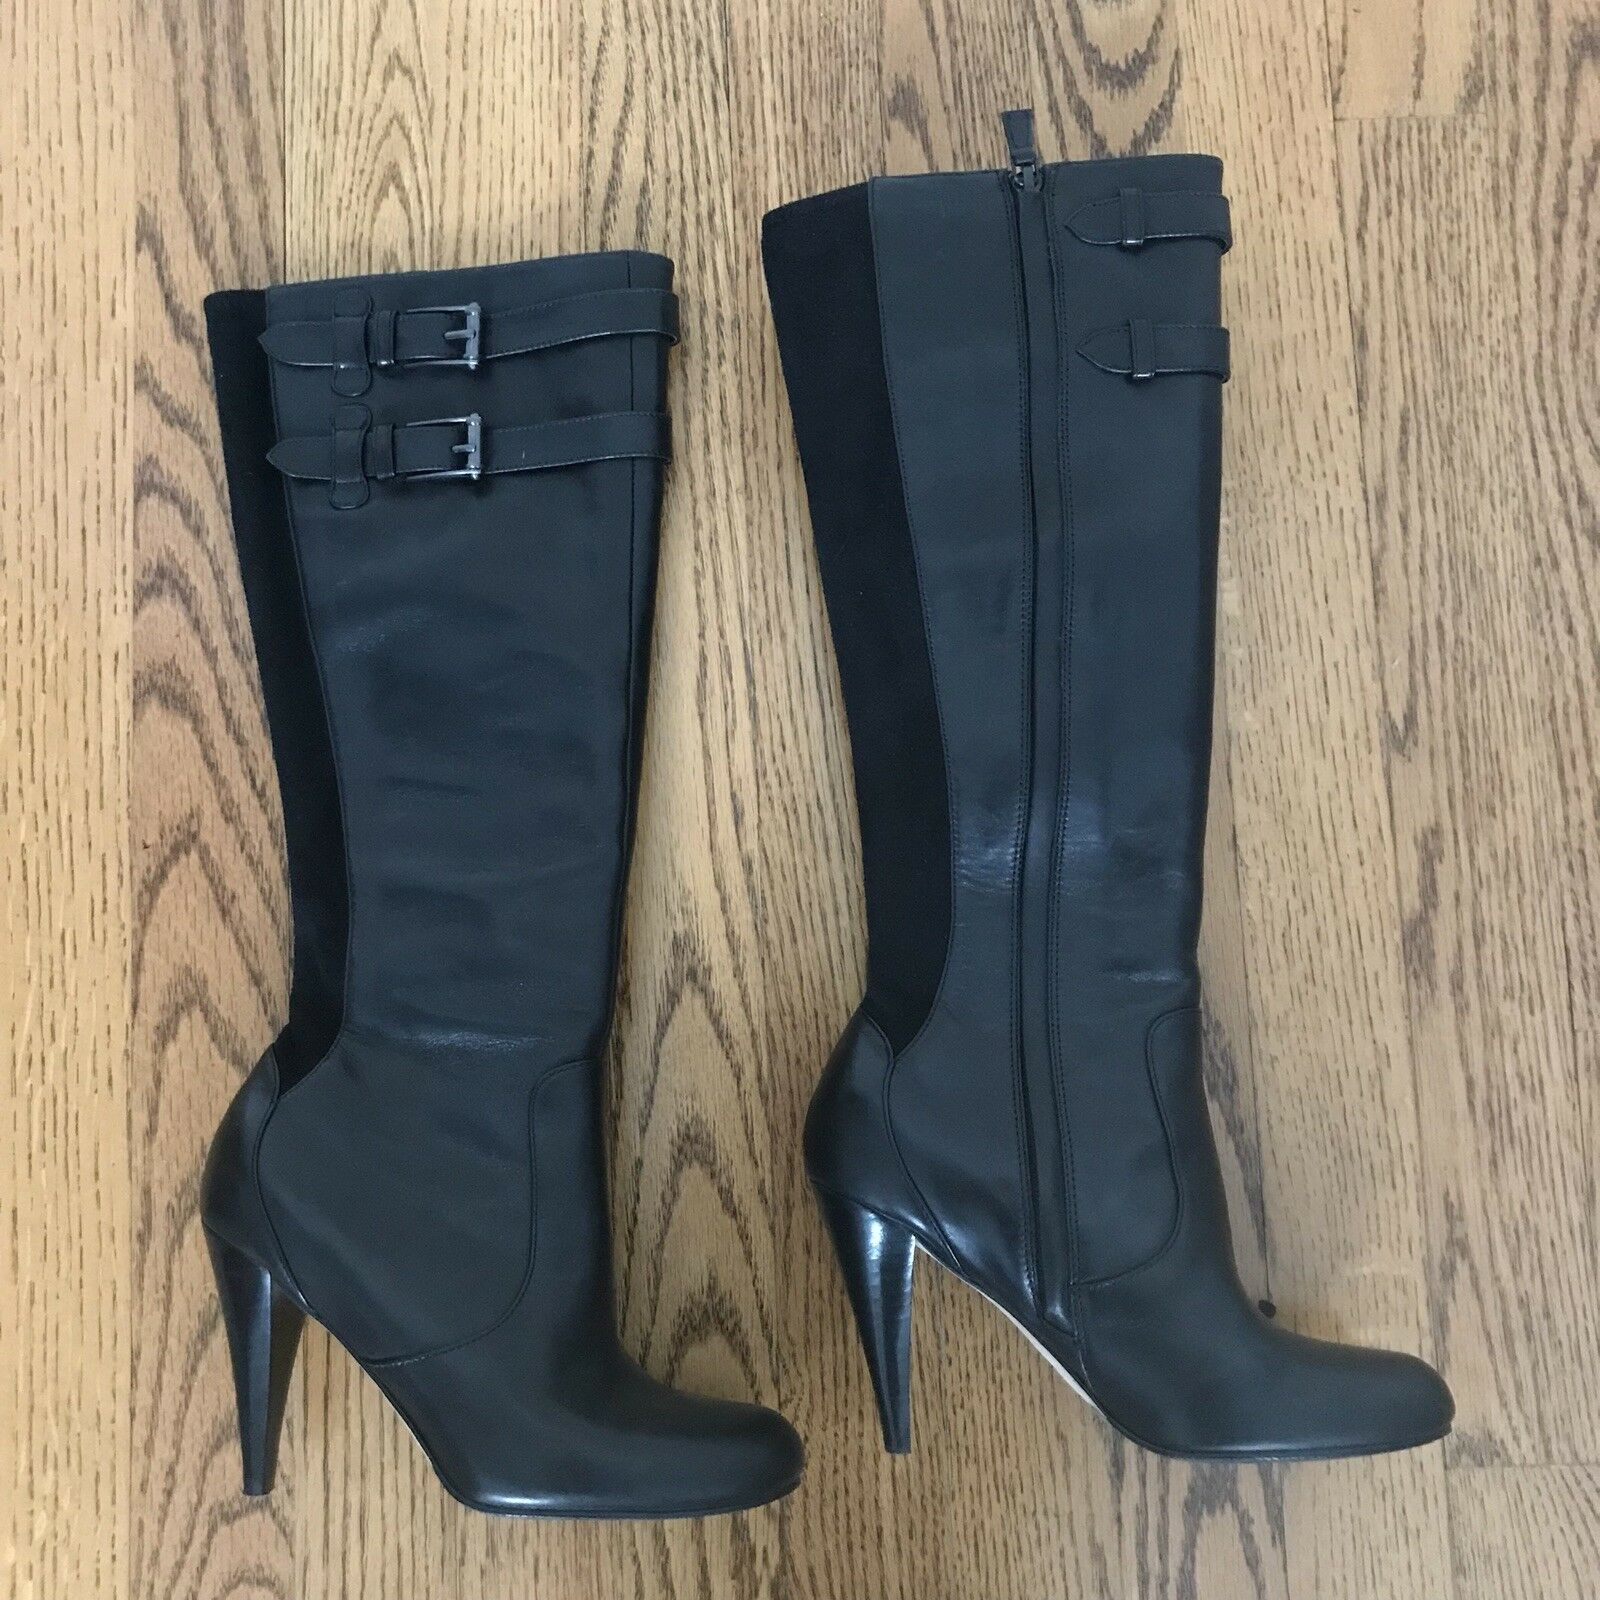 Cole Haan Jalisa Tall noir Leather bottes femmes's 5.5B EUC